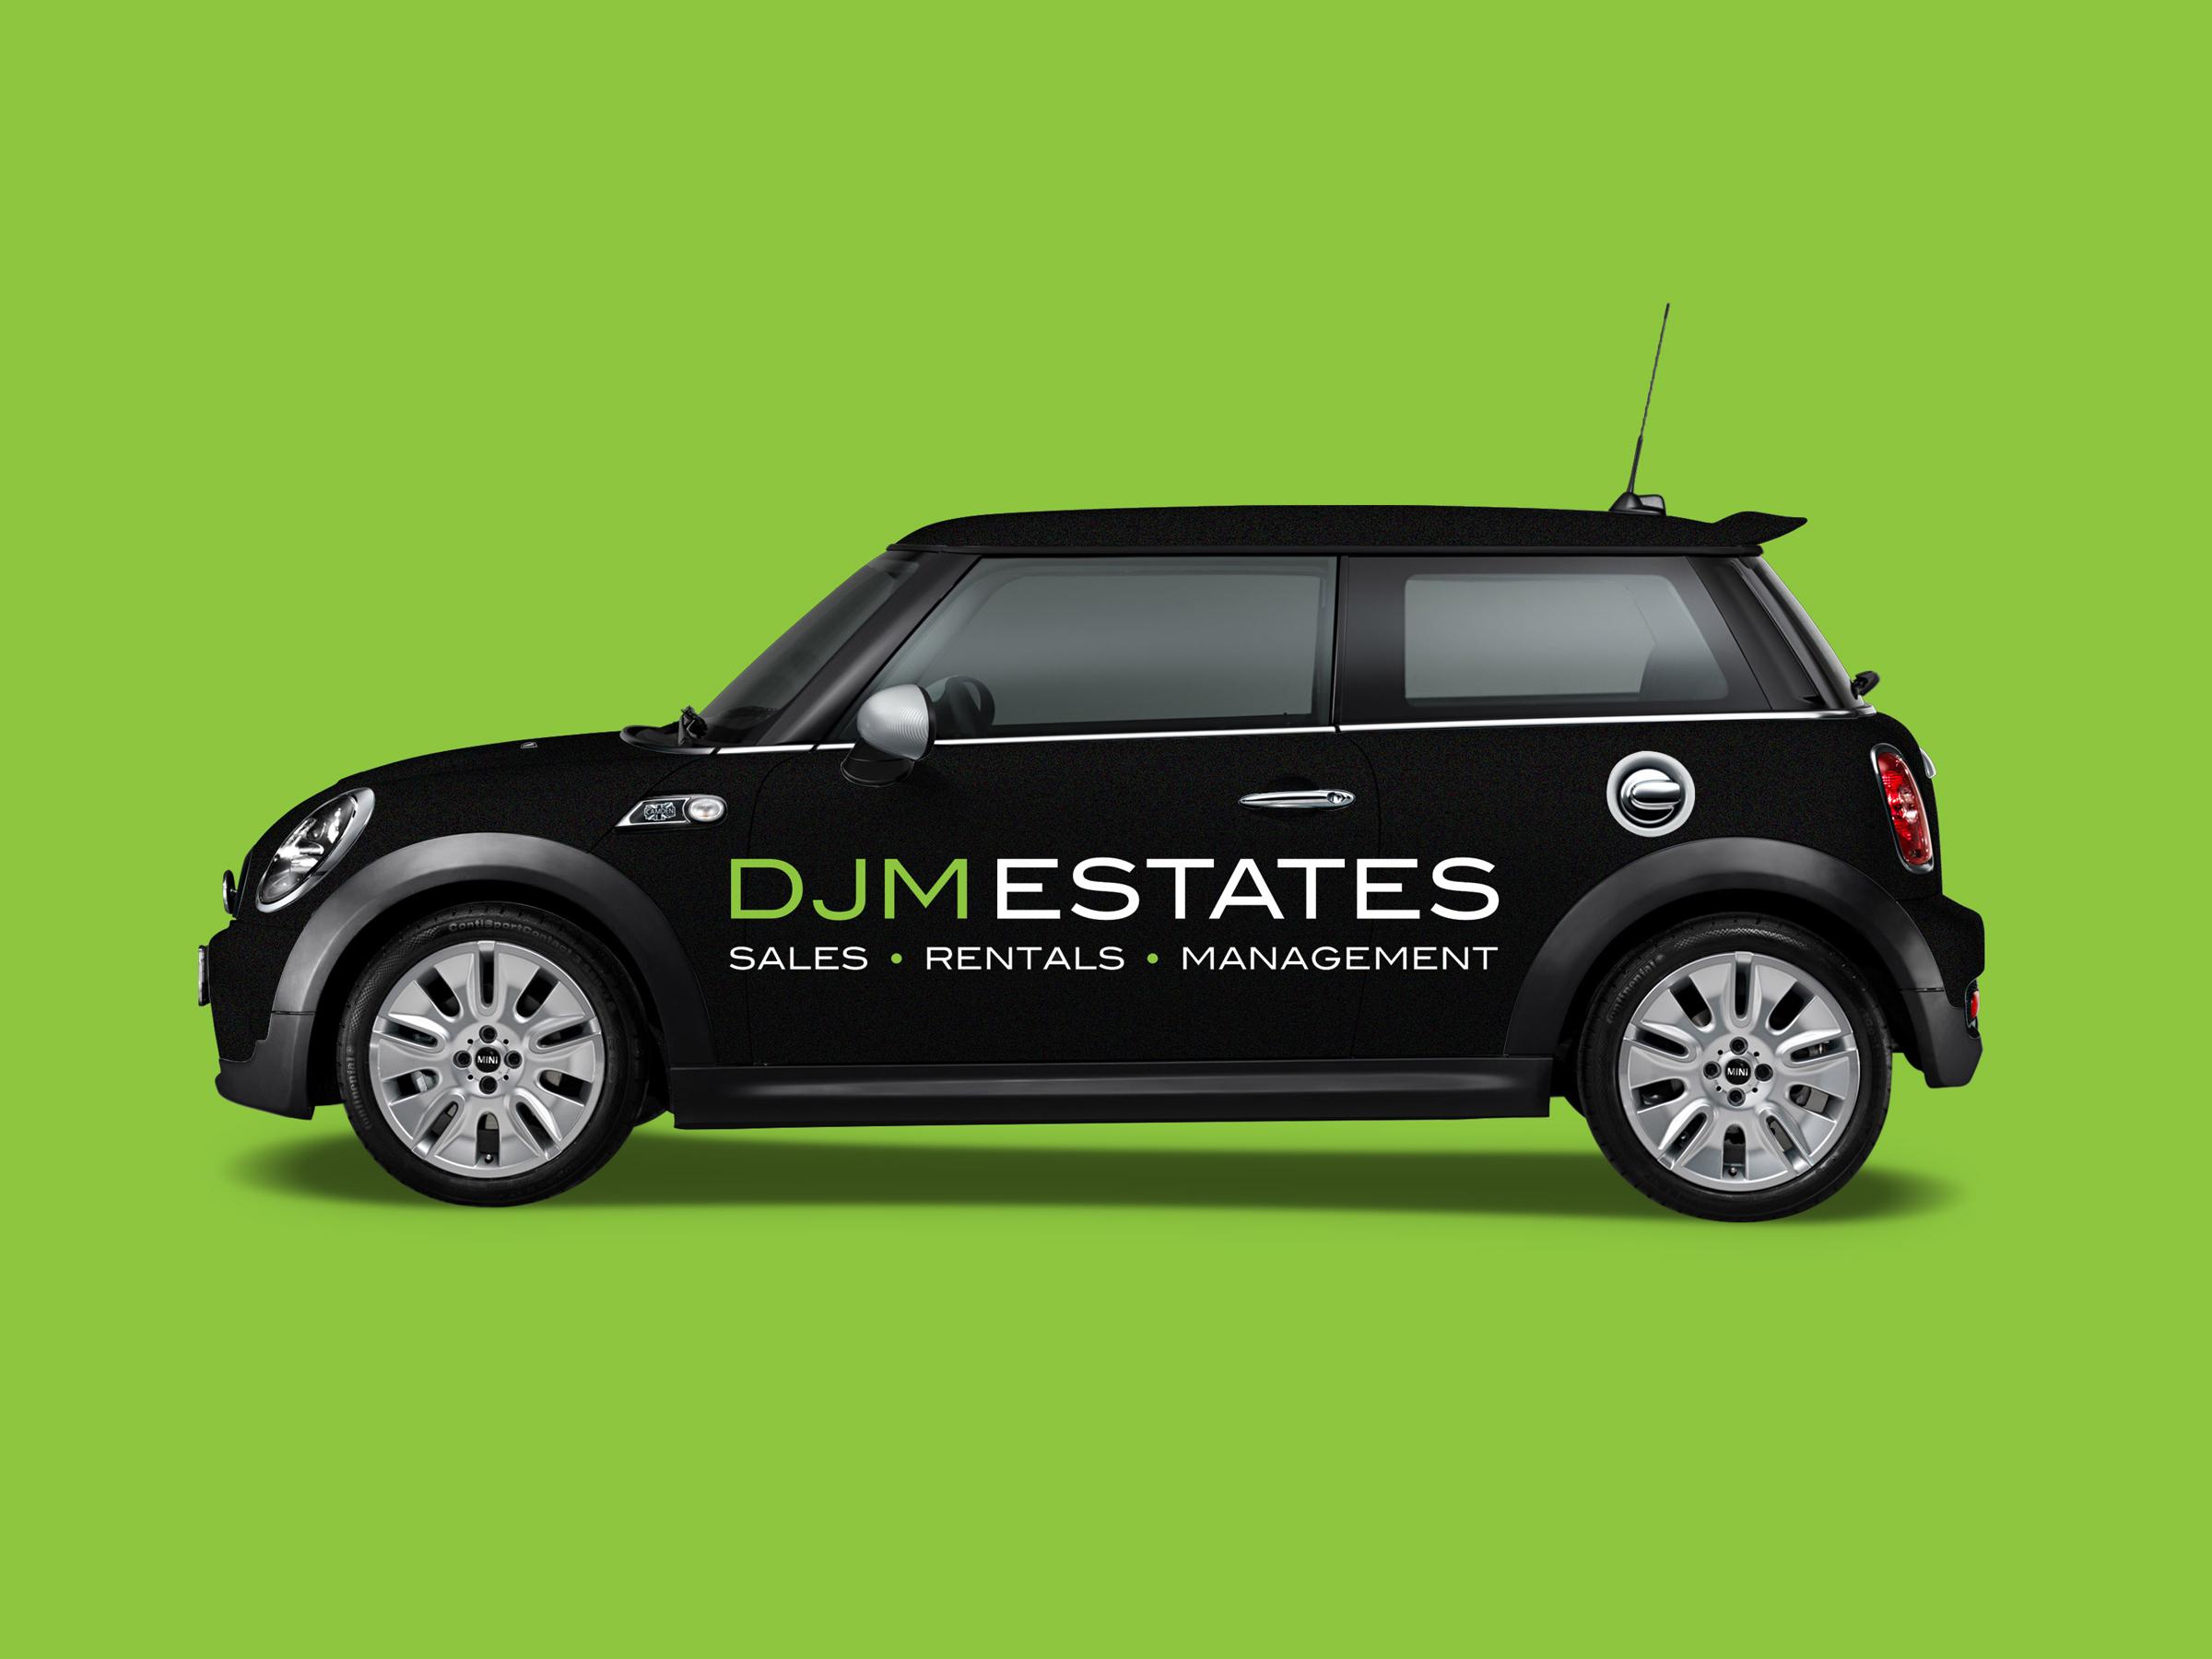 DJM Estates